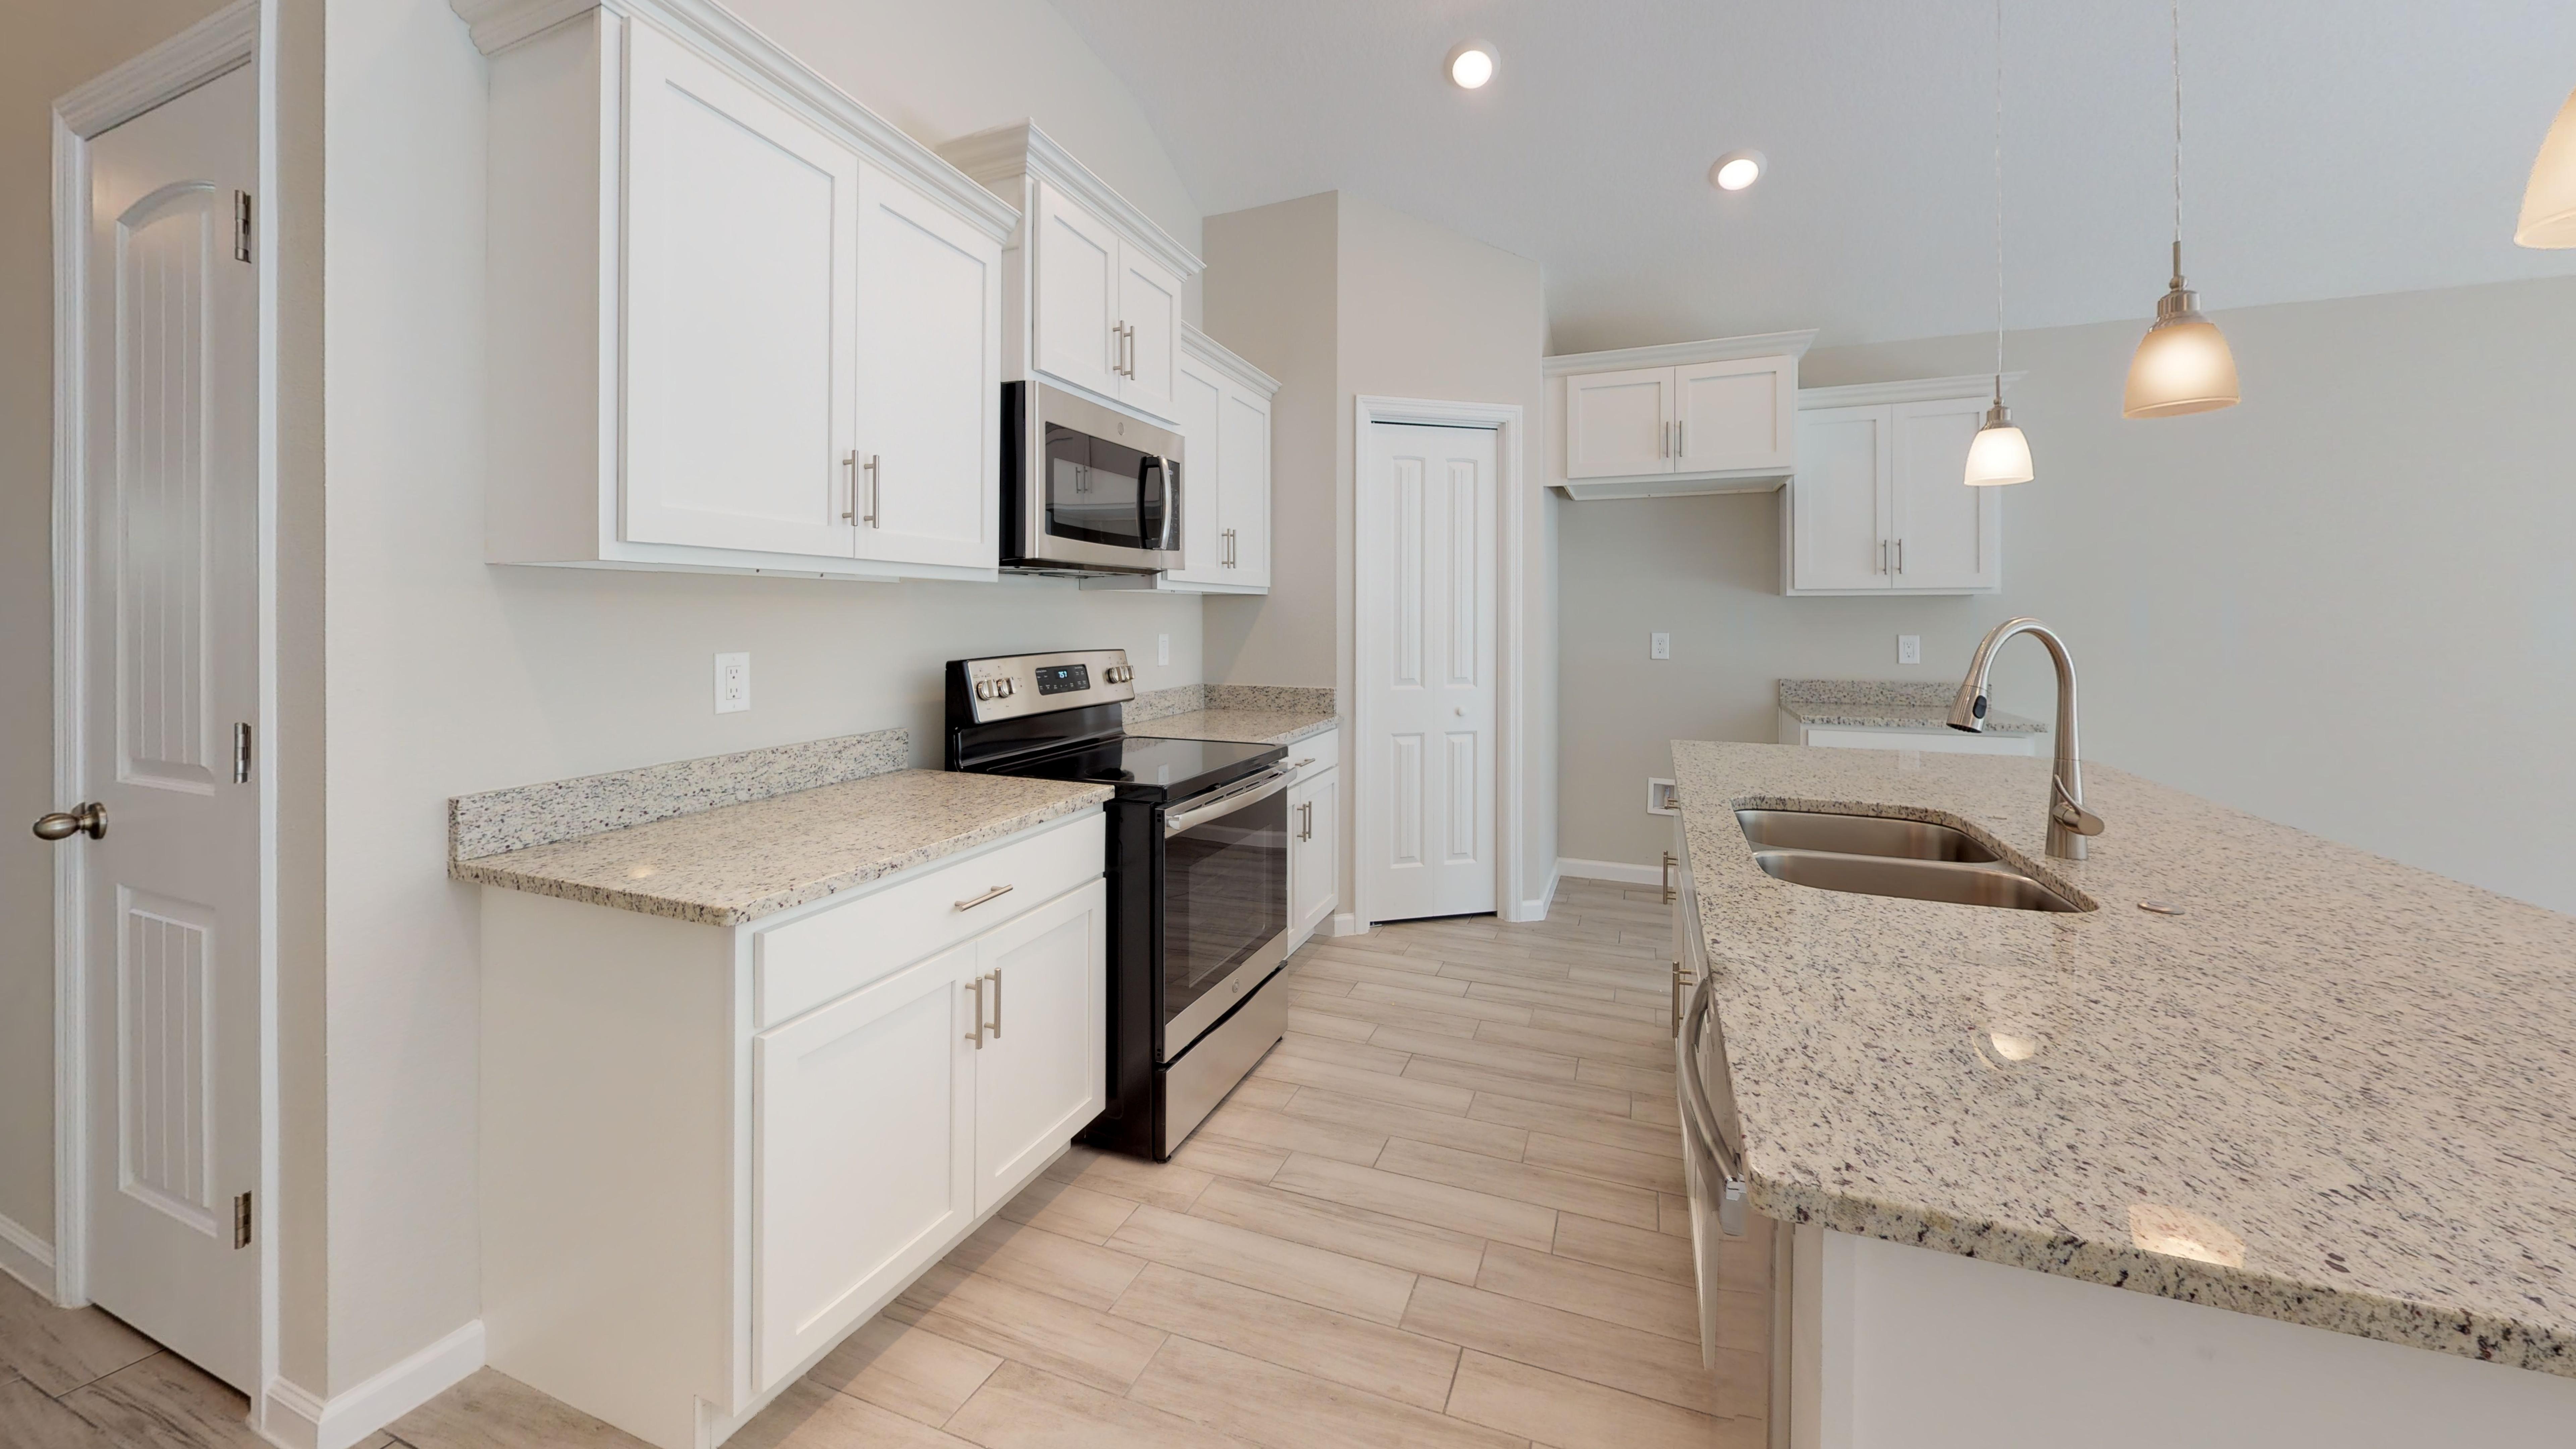 193-Denton-Ave-Kitchen-2